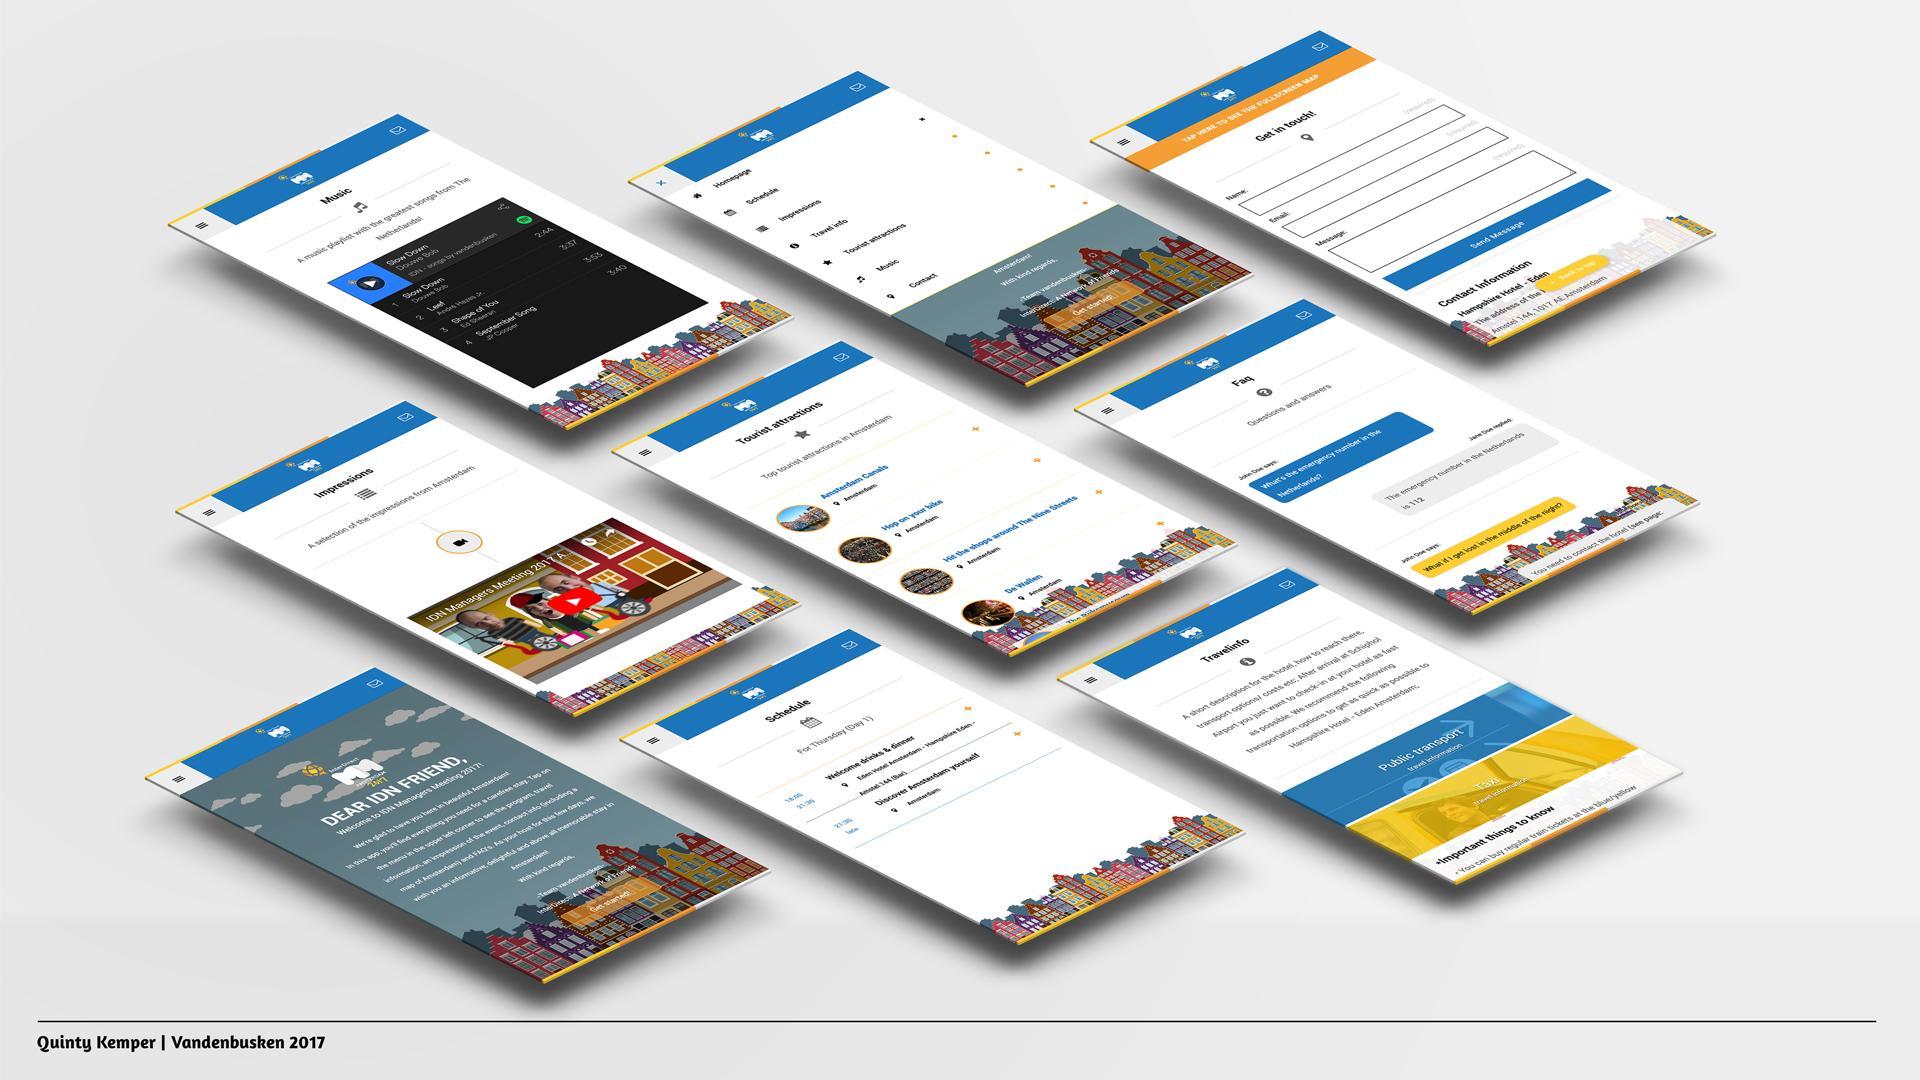 Quinty Kemper Portfolio 2016 IDN app screens